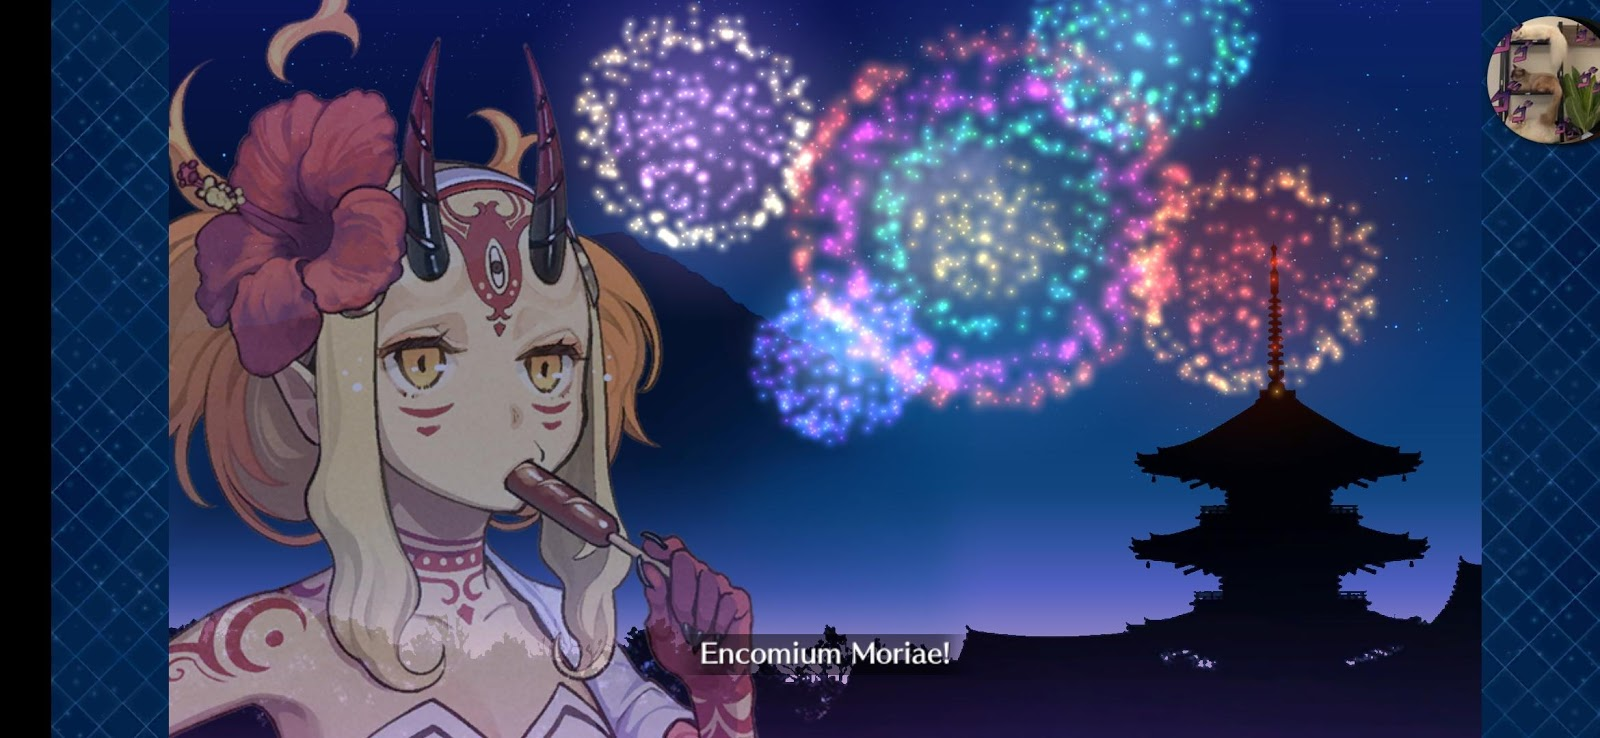 fate-grand-order-fireworks-display